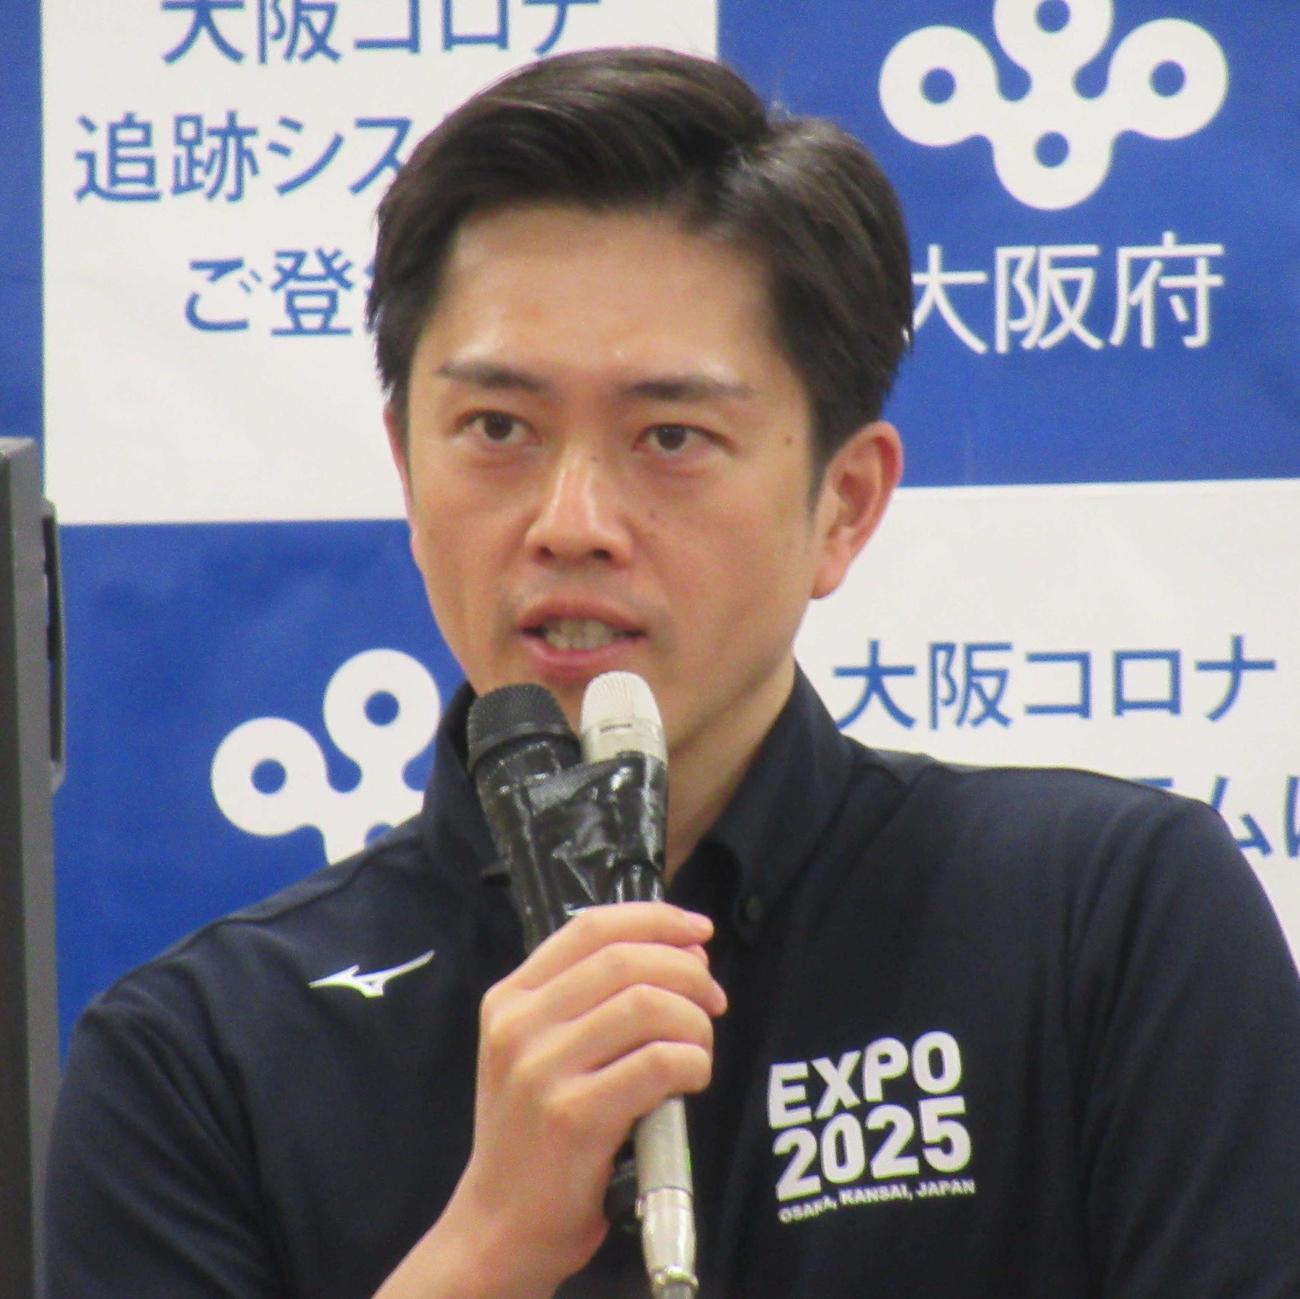 吉村洋文知事(20年6月17日撮影)